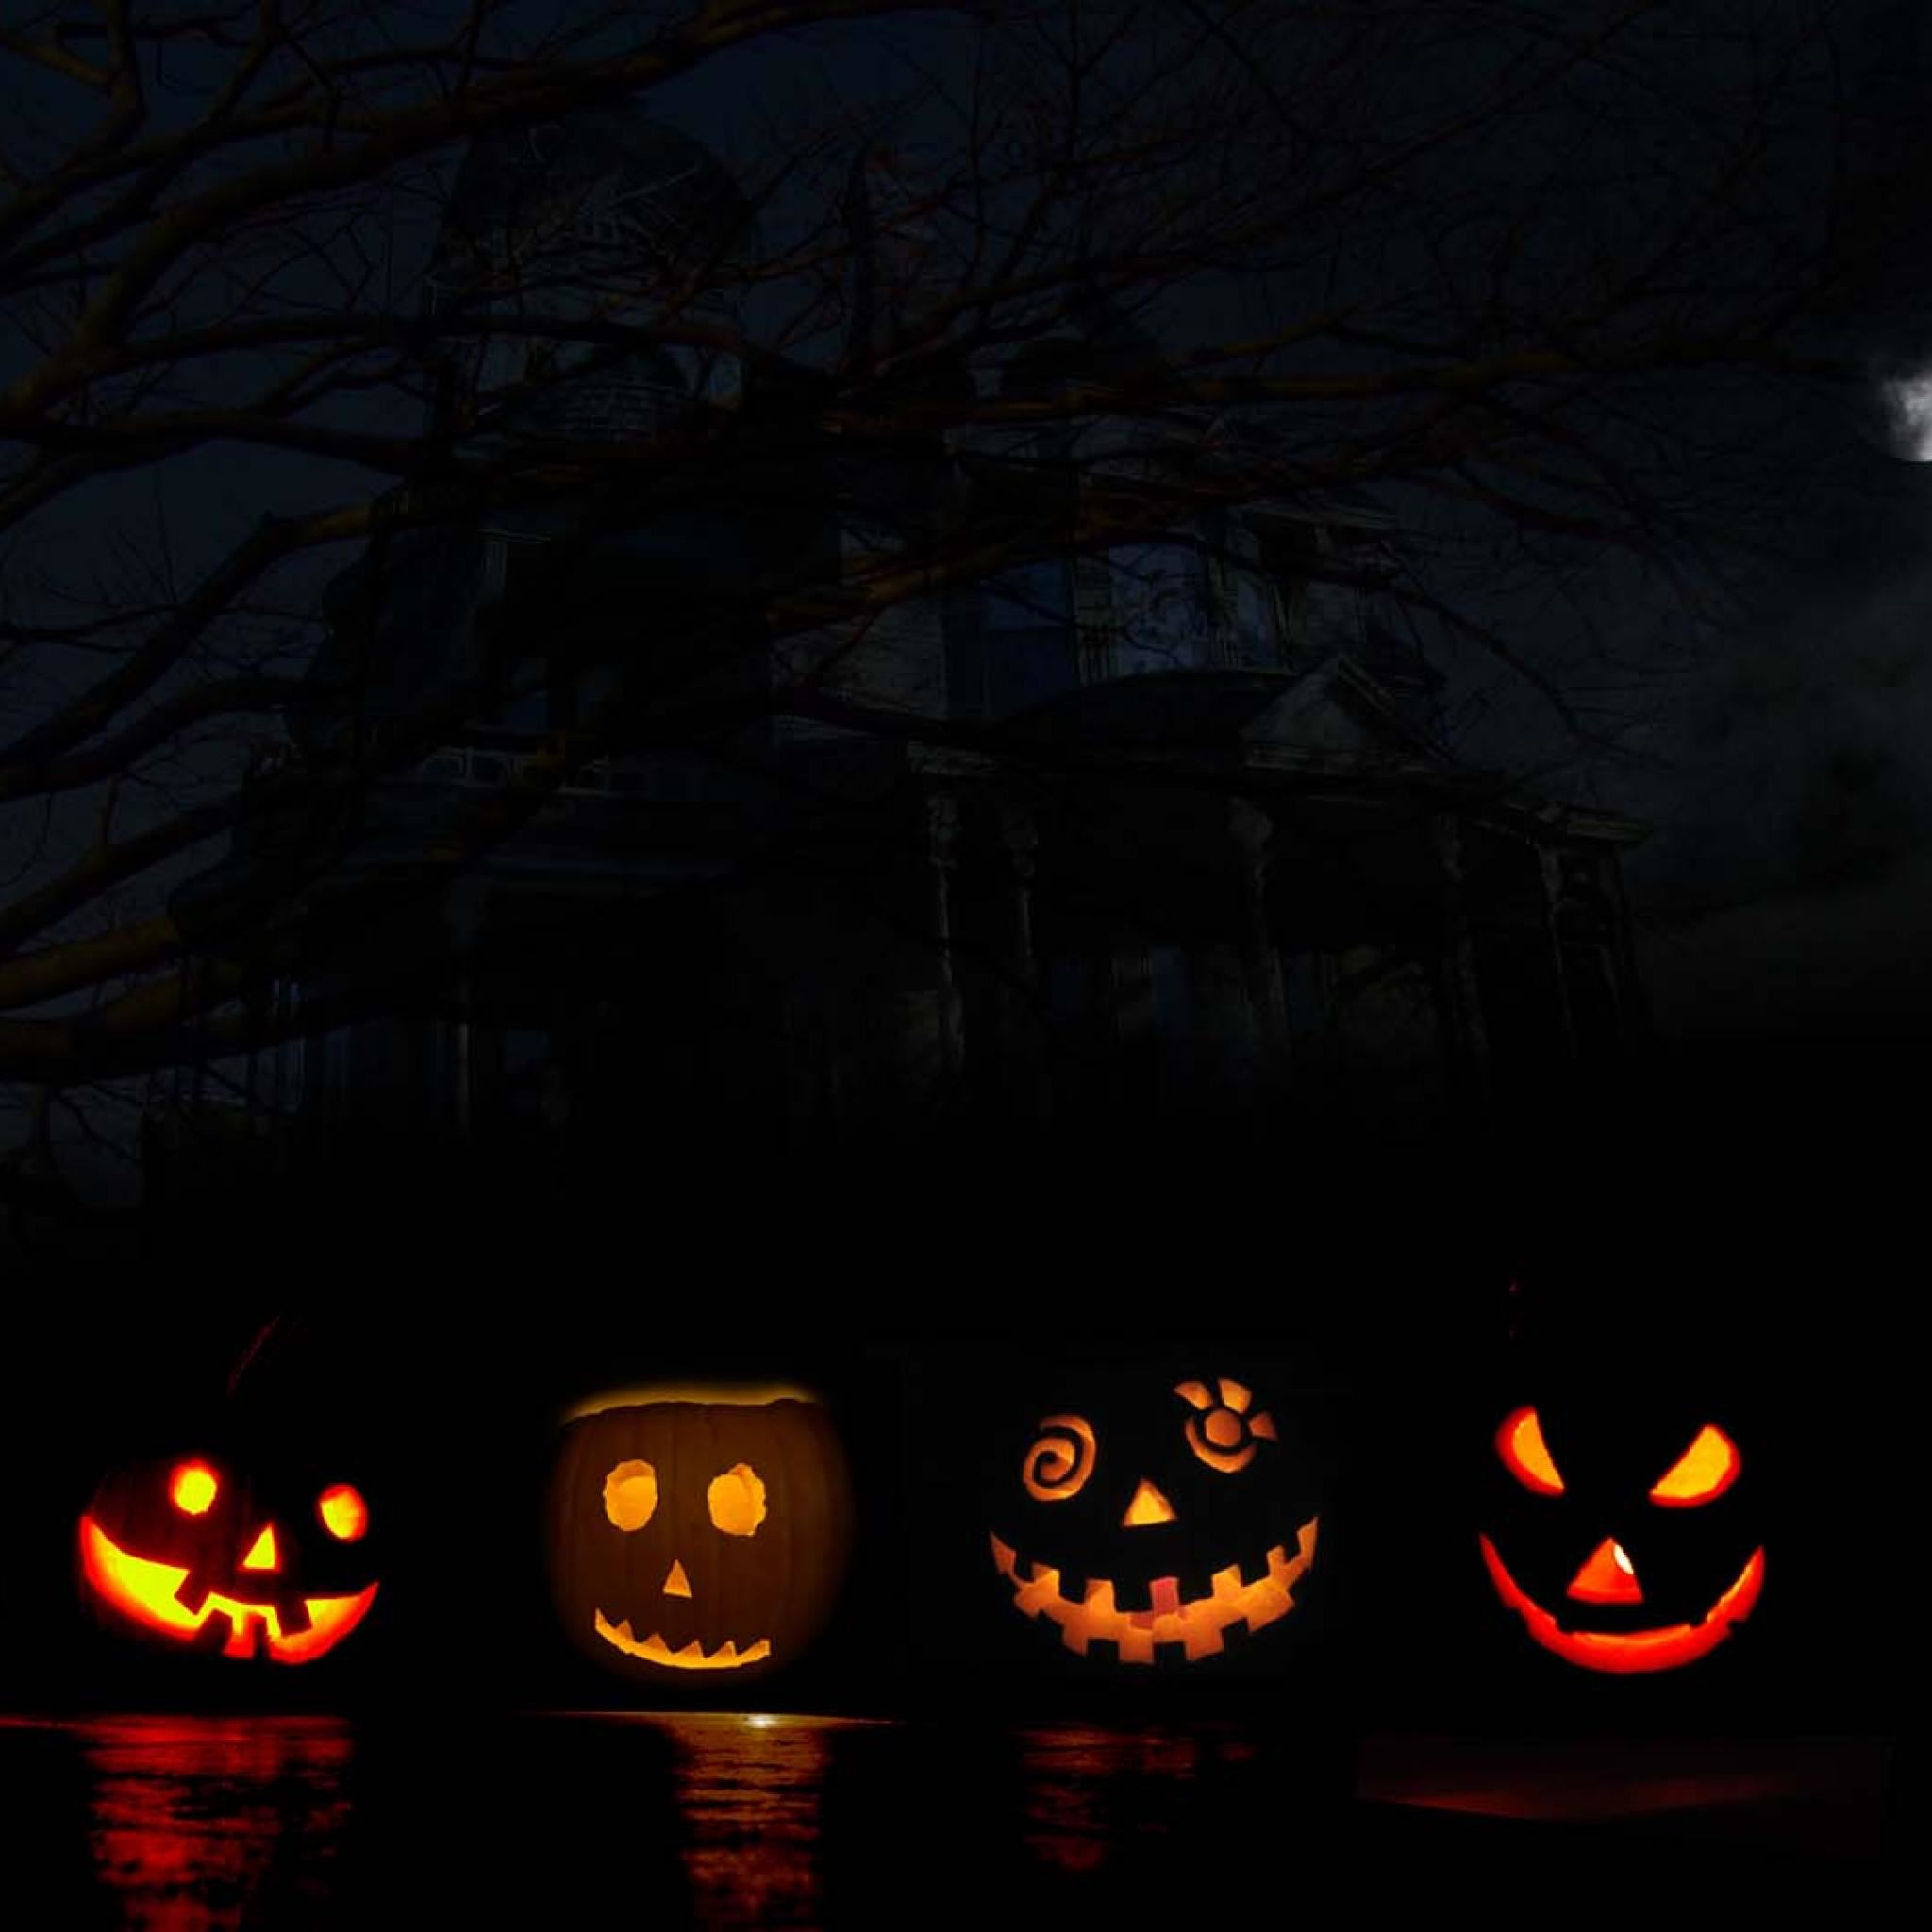 Best Halloween Ipad Air Wallpapers Hd Ilikewallpaper